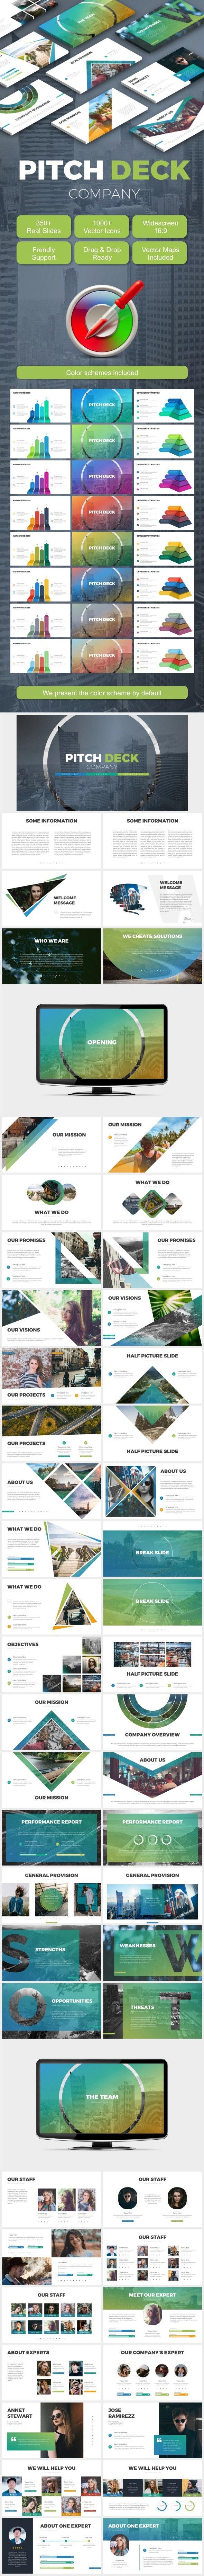 9 Best Presentation & Powerpoint Templates for June 2019